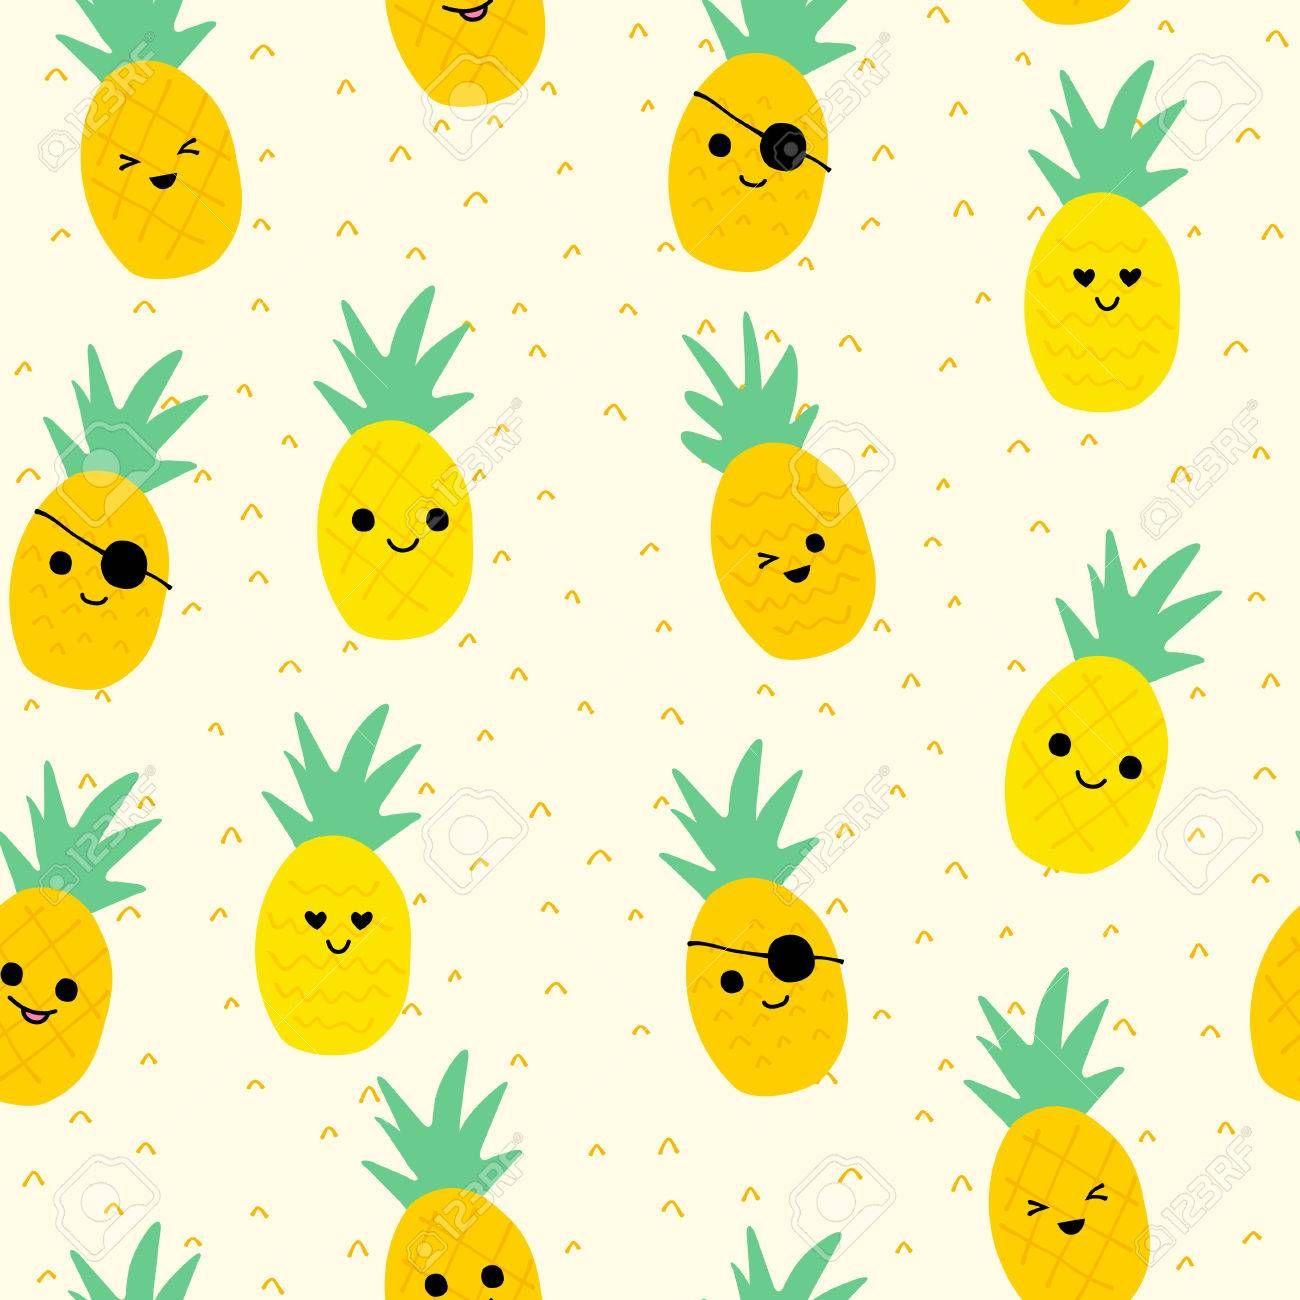 Seamless Pineapple Pattern Cute Pineapple Doodle Pattern For Cute Pineapple Wallpaper Pineapple Wallpaper Doodle Patterns